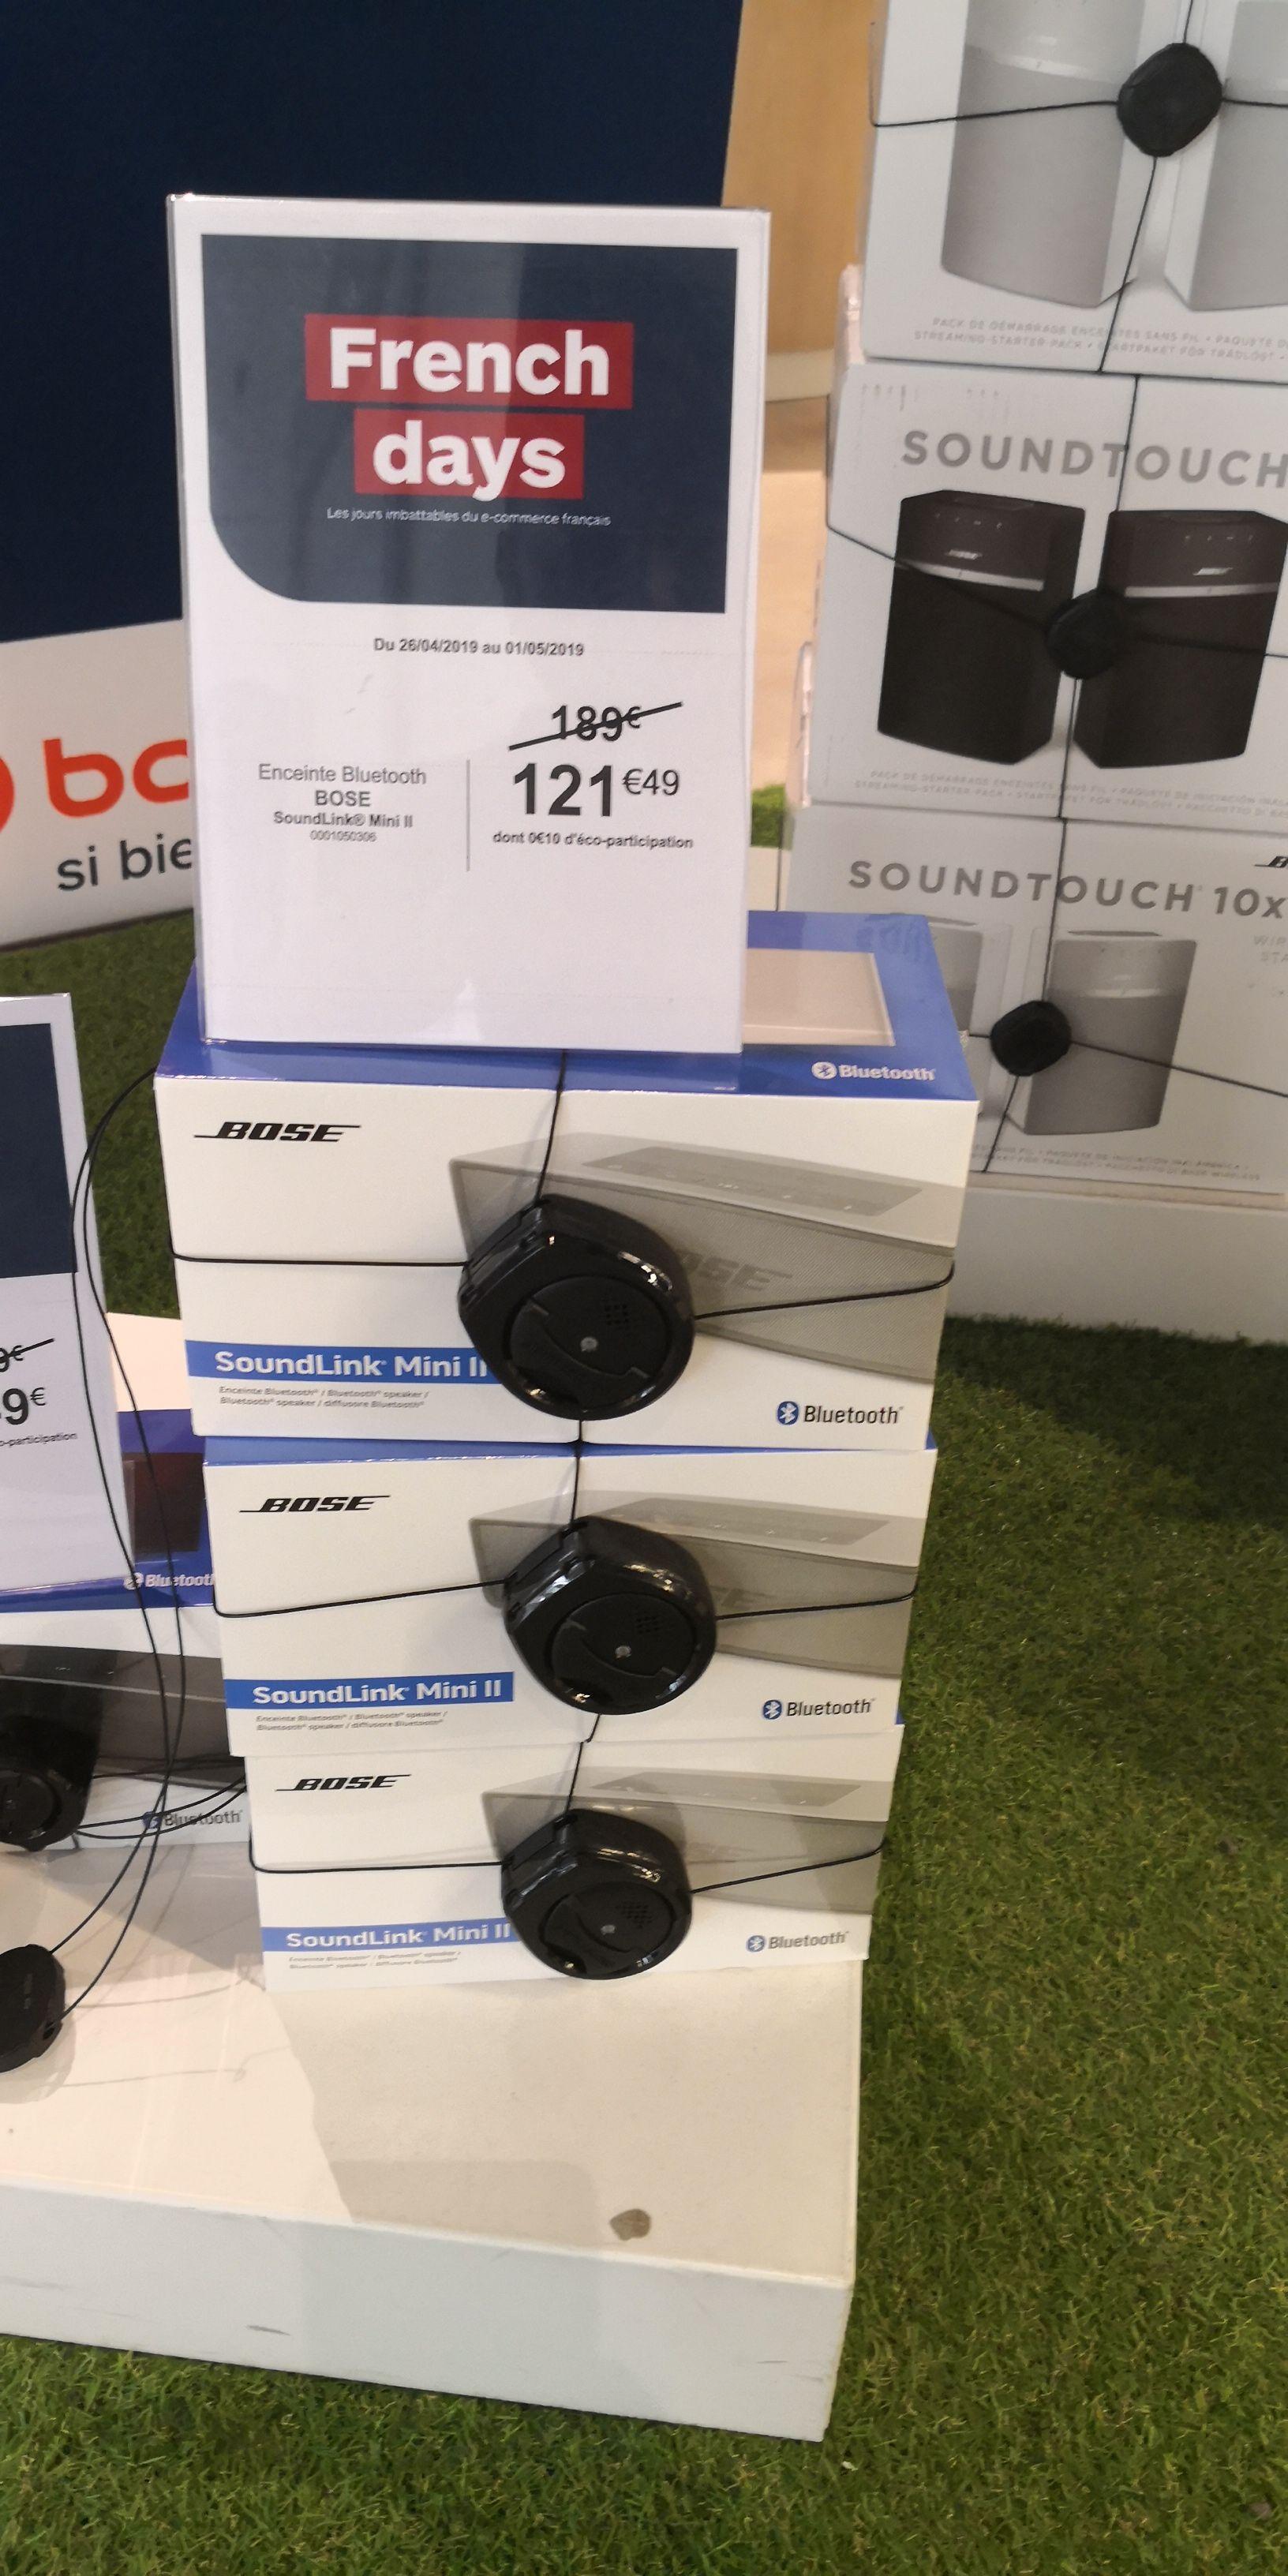 Enceinte Bluetooth Bose SoundLink Mini II (blanc) - Vélizy-Villacoublay (78)